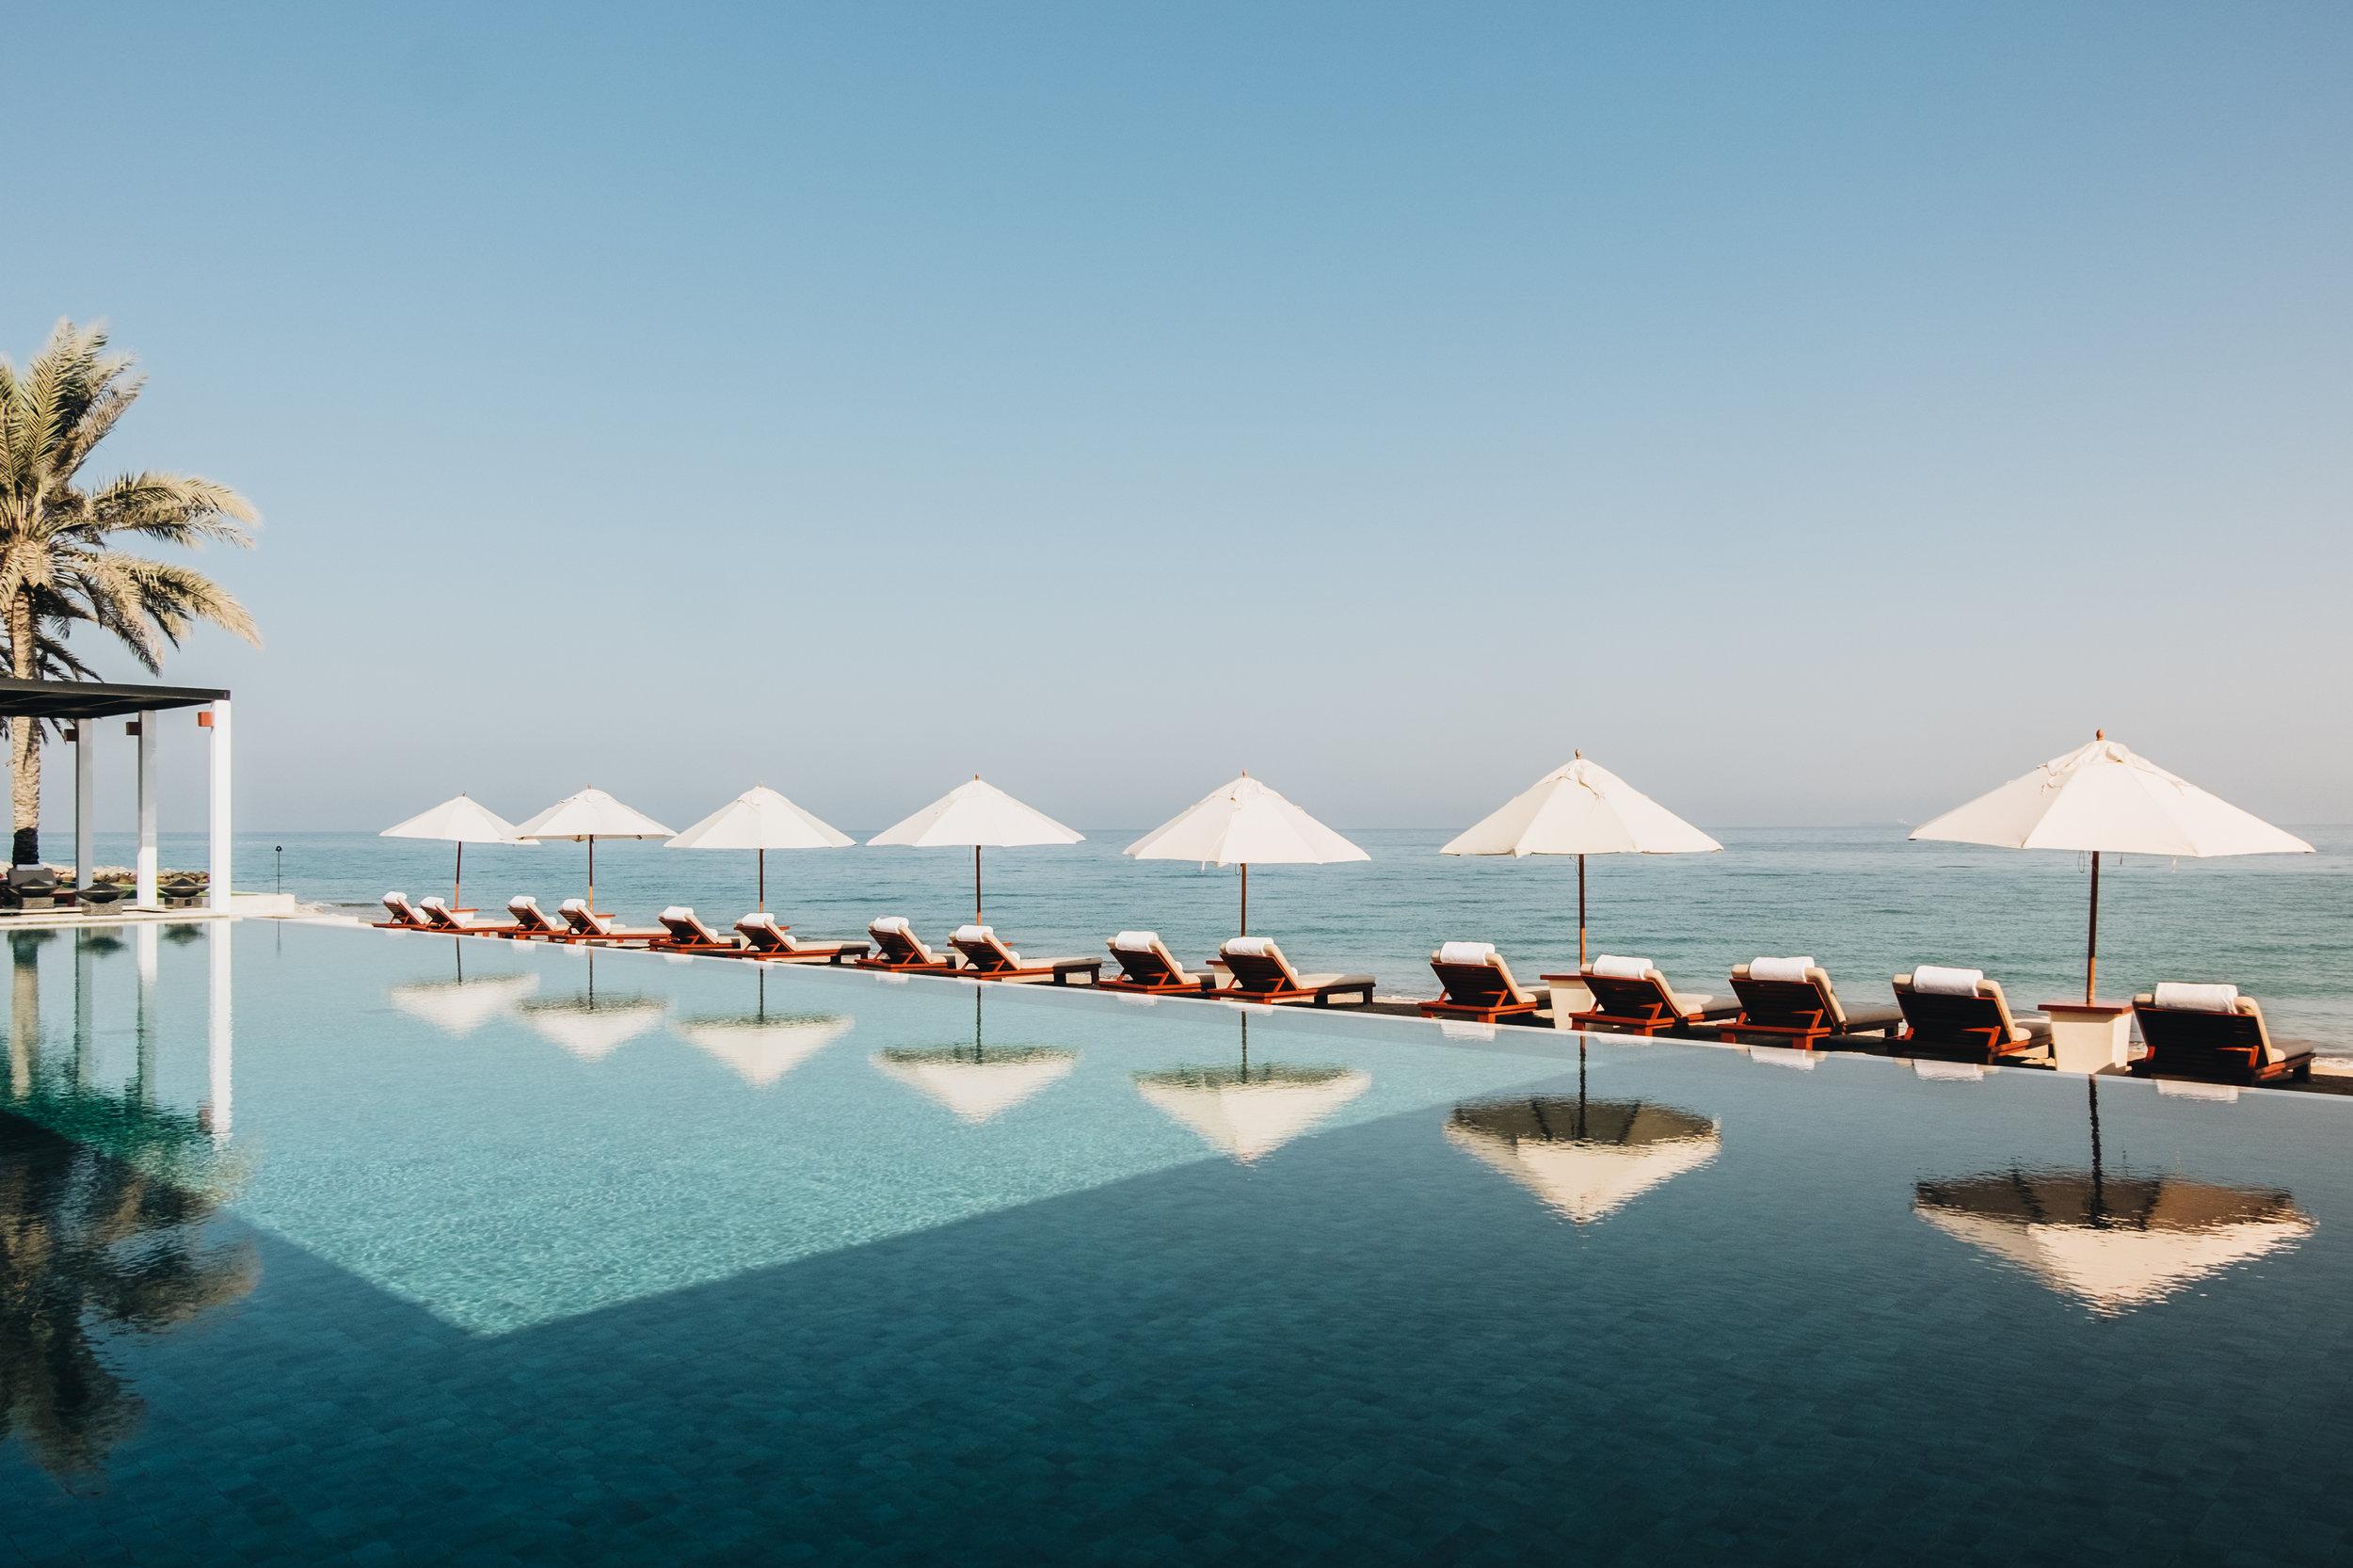 Oman-6010.jpg